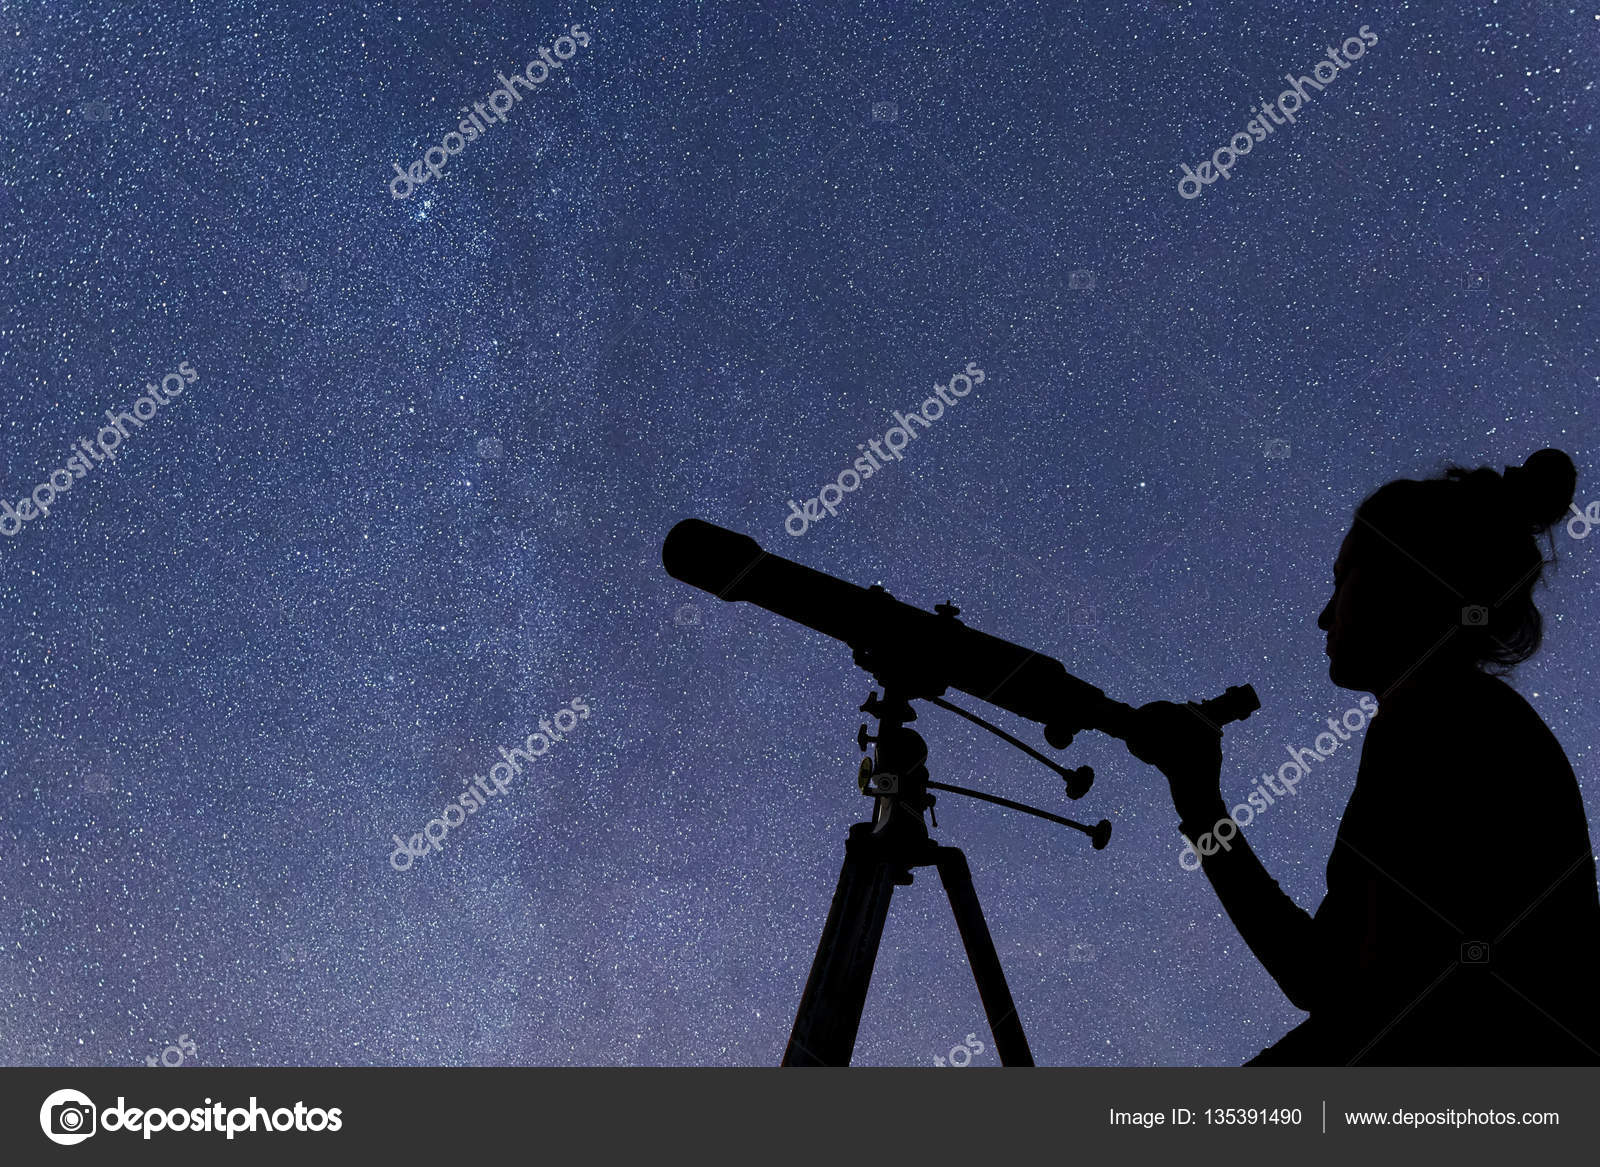 Frau mit teleskop die sterne beobachten sternenhimmel frau und ni